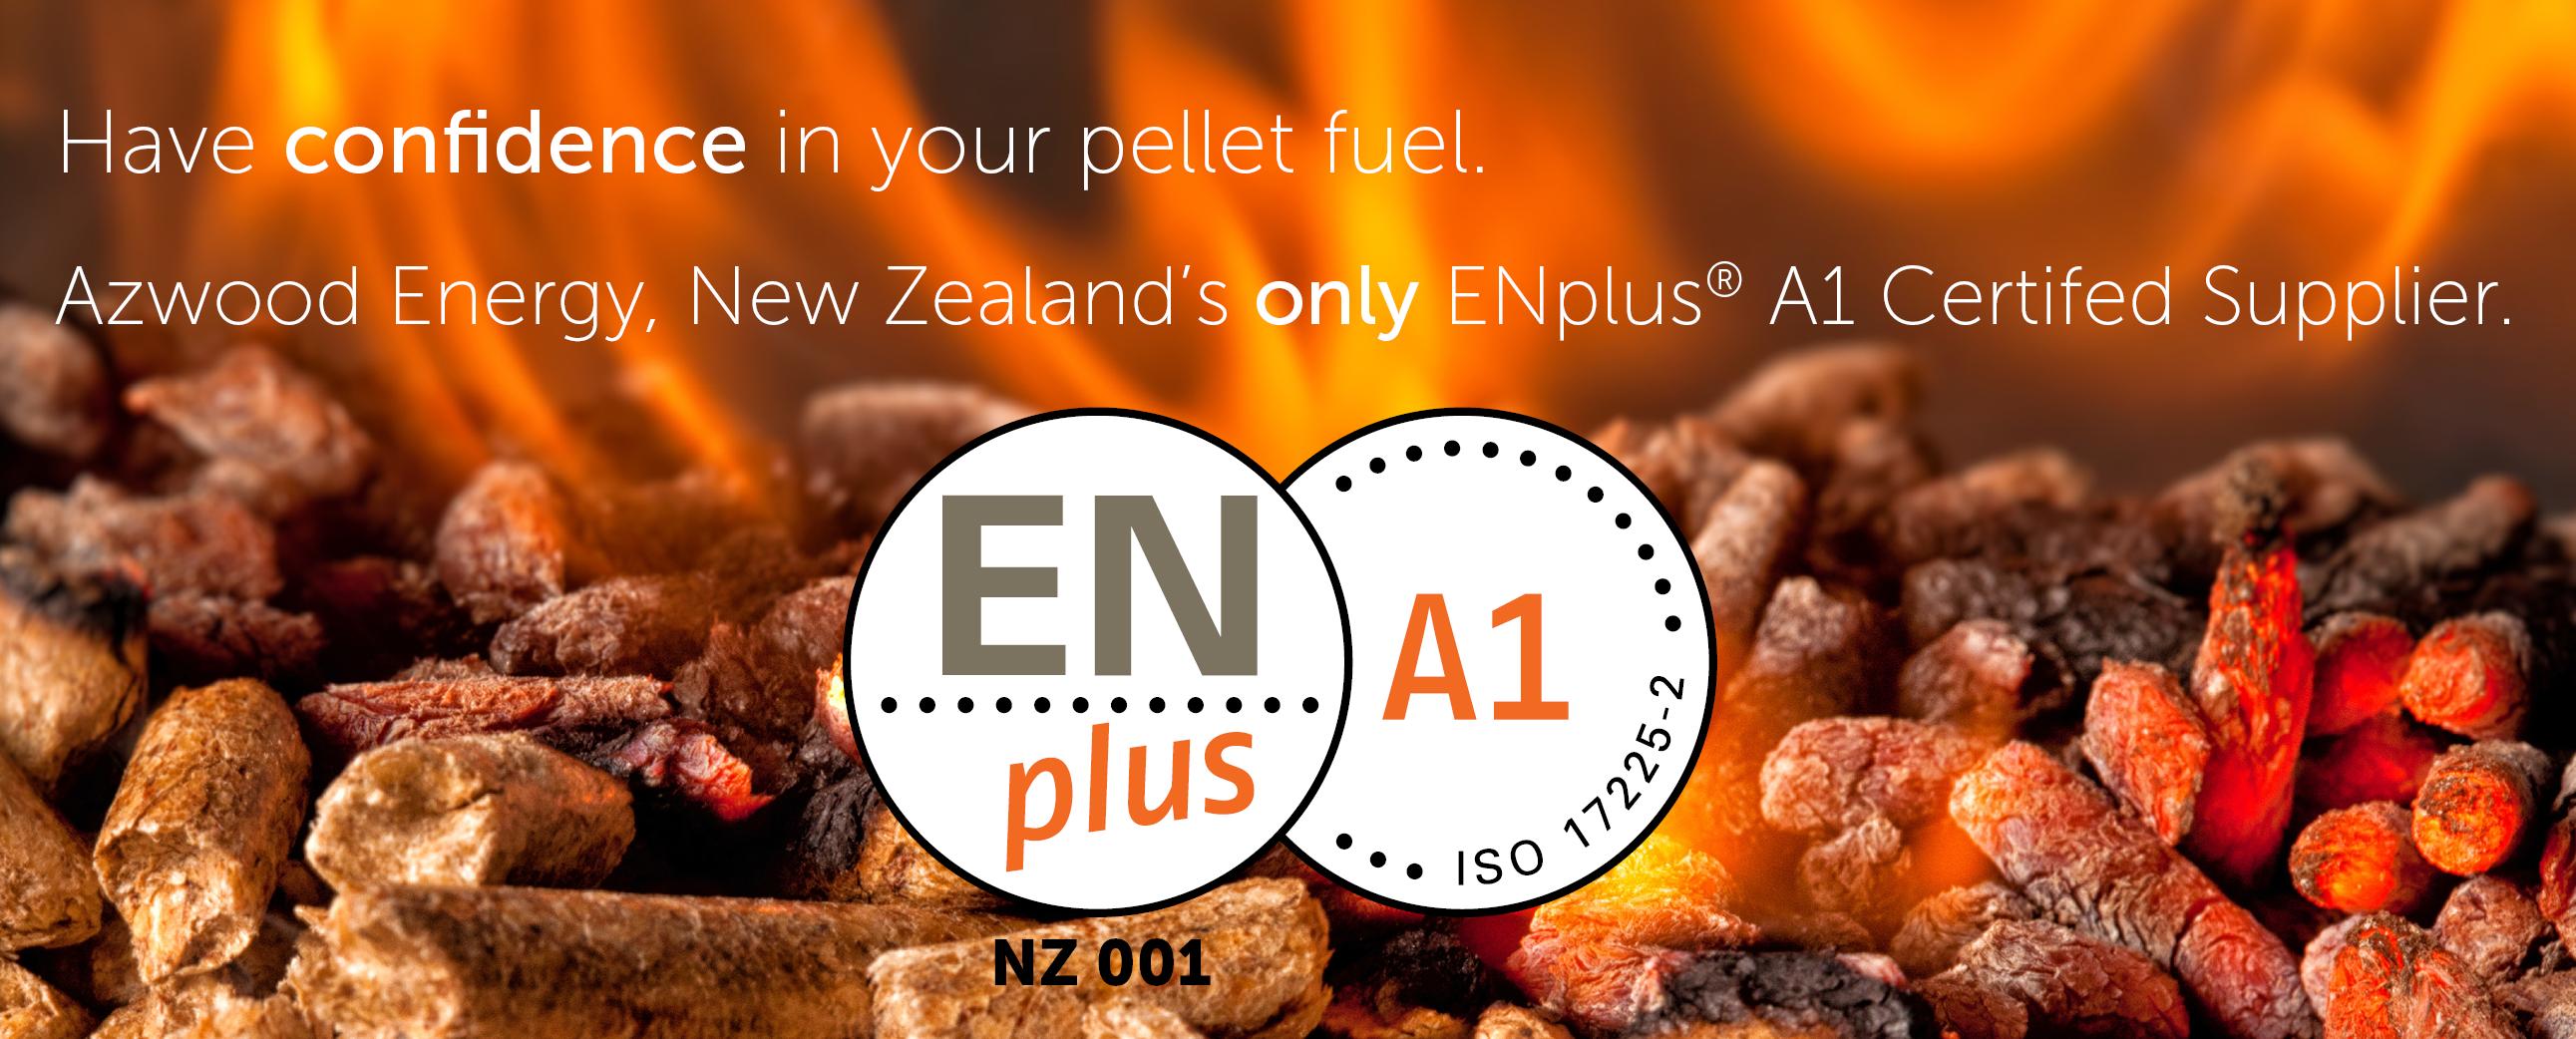 Azwood Energy, Enplus A1 Certified